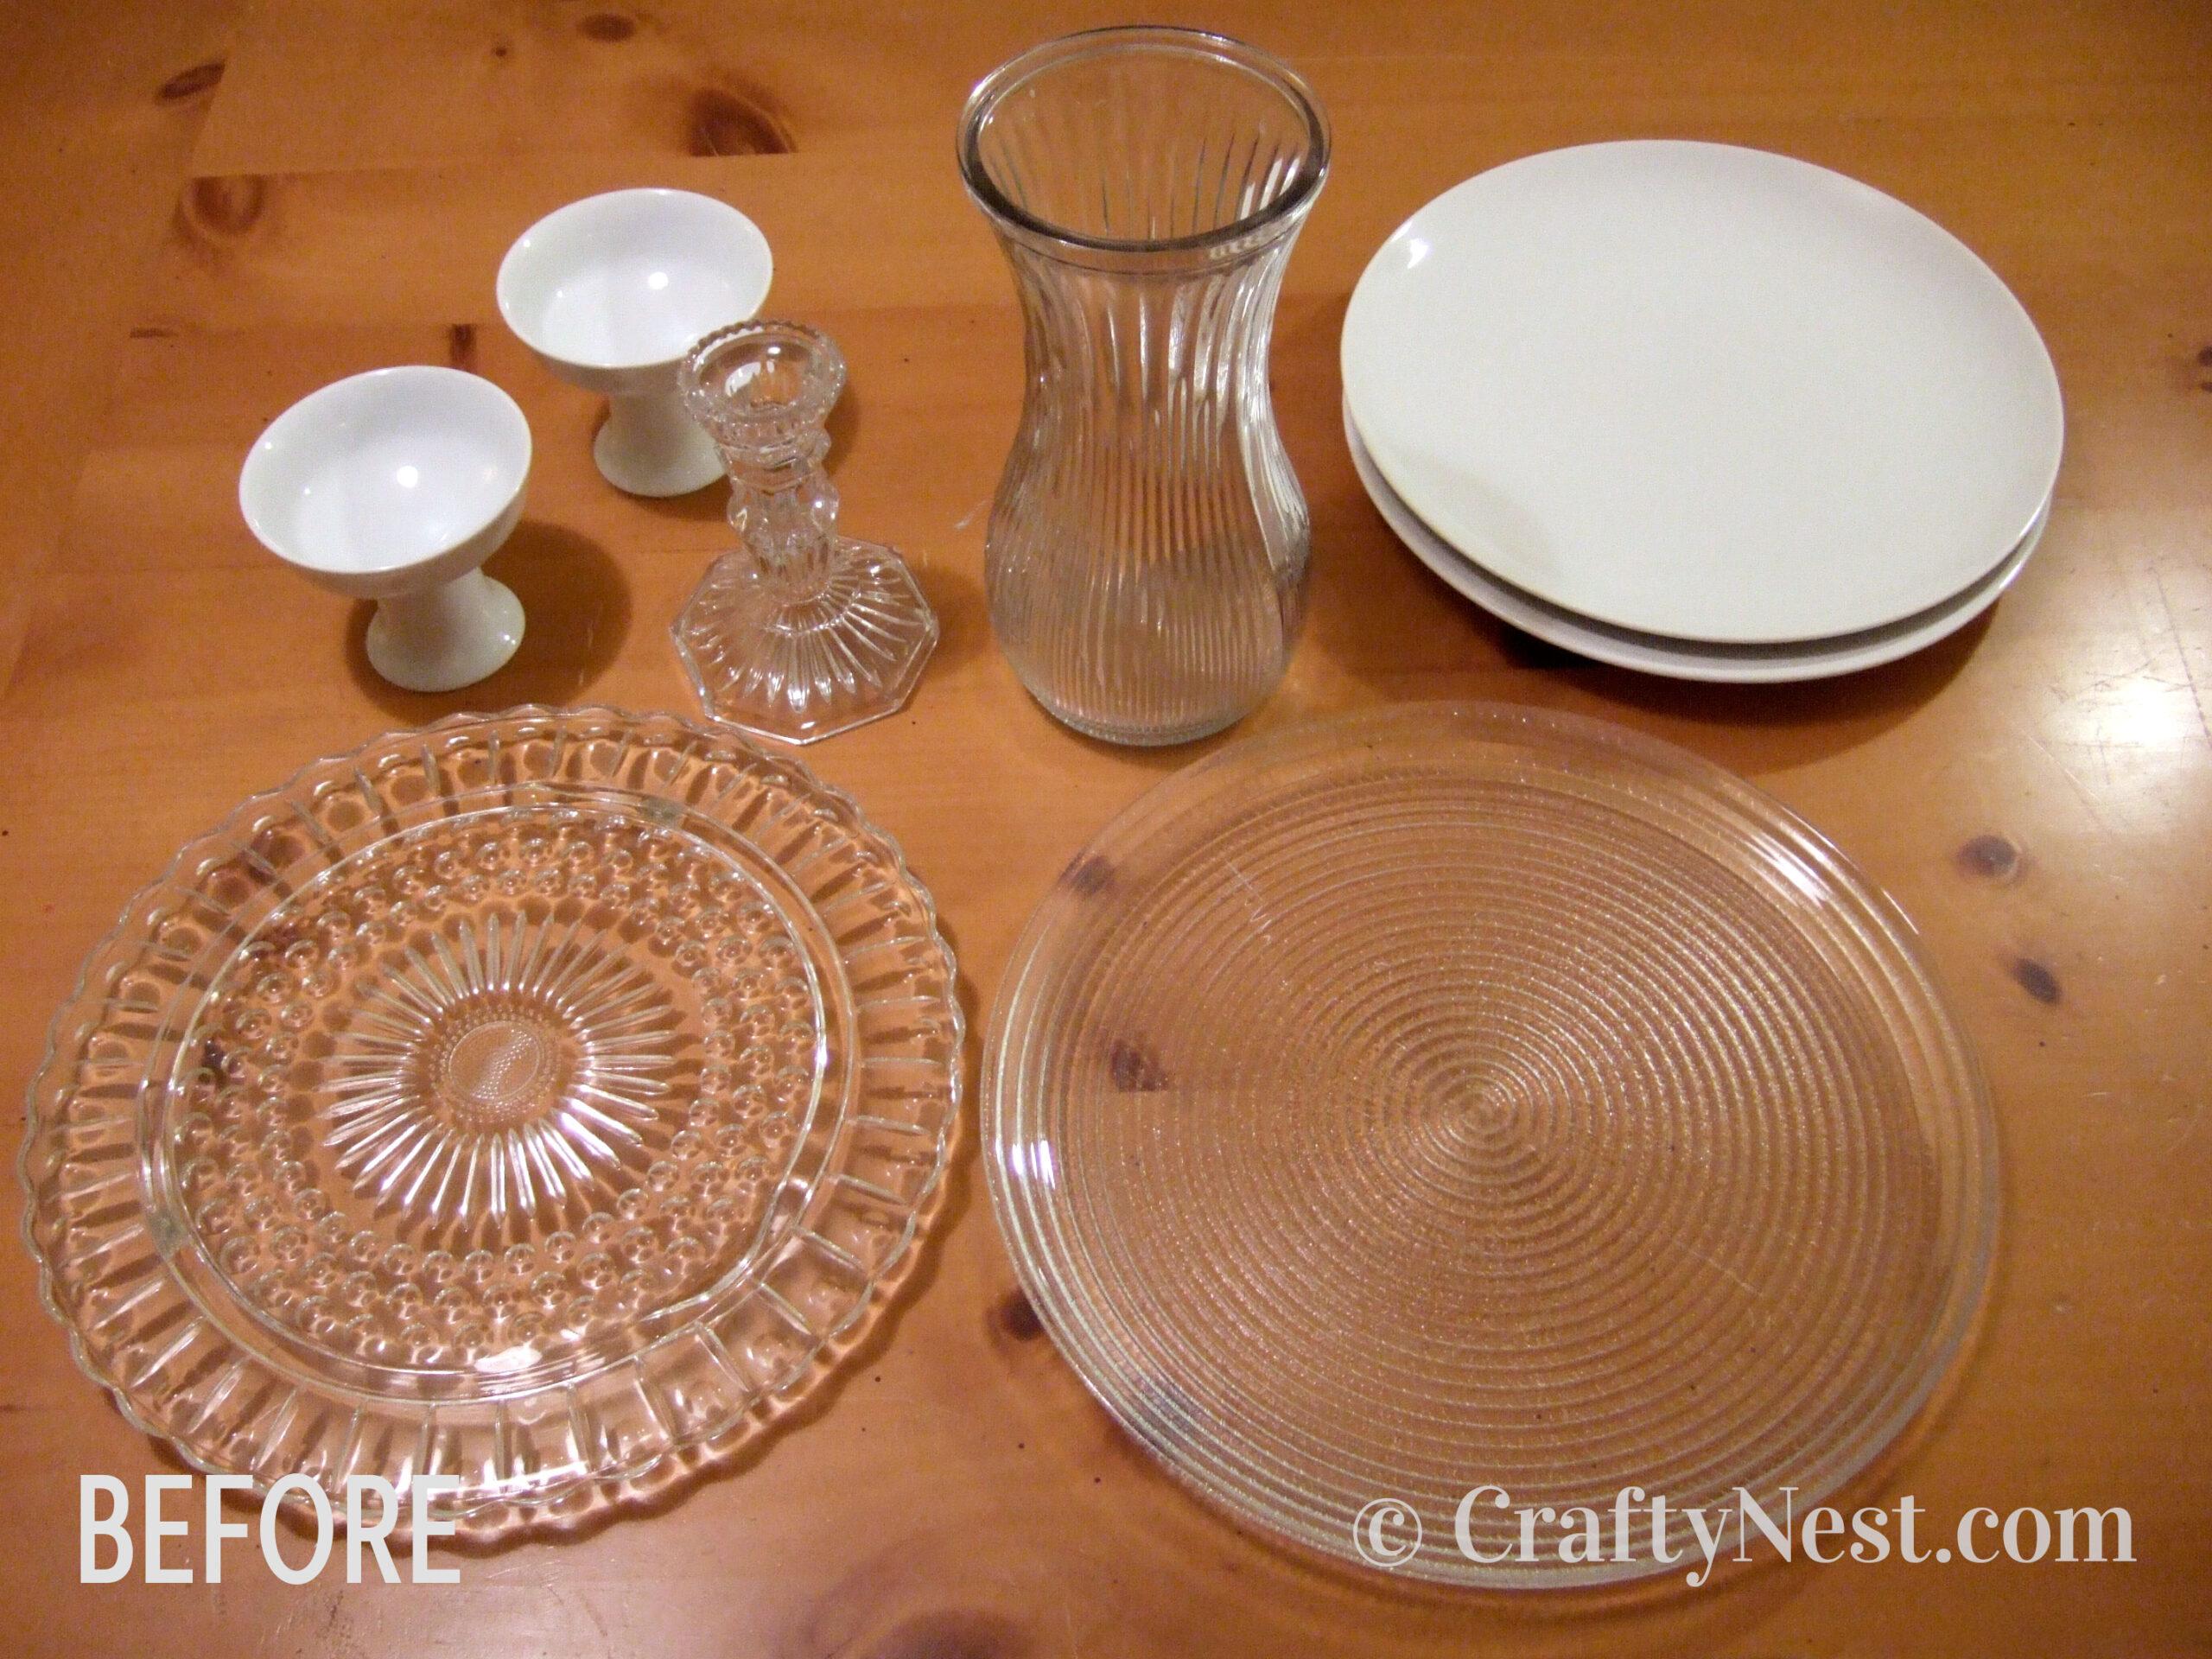 Plates, vases, candlesticks, etc., photo